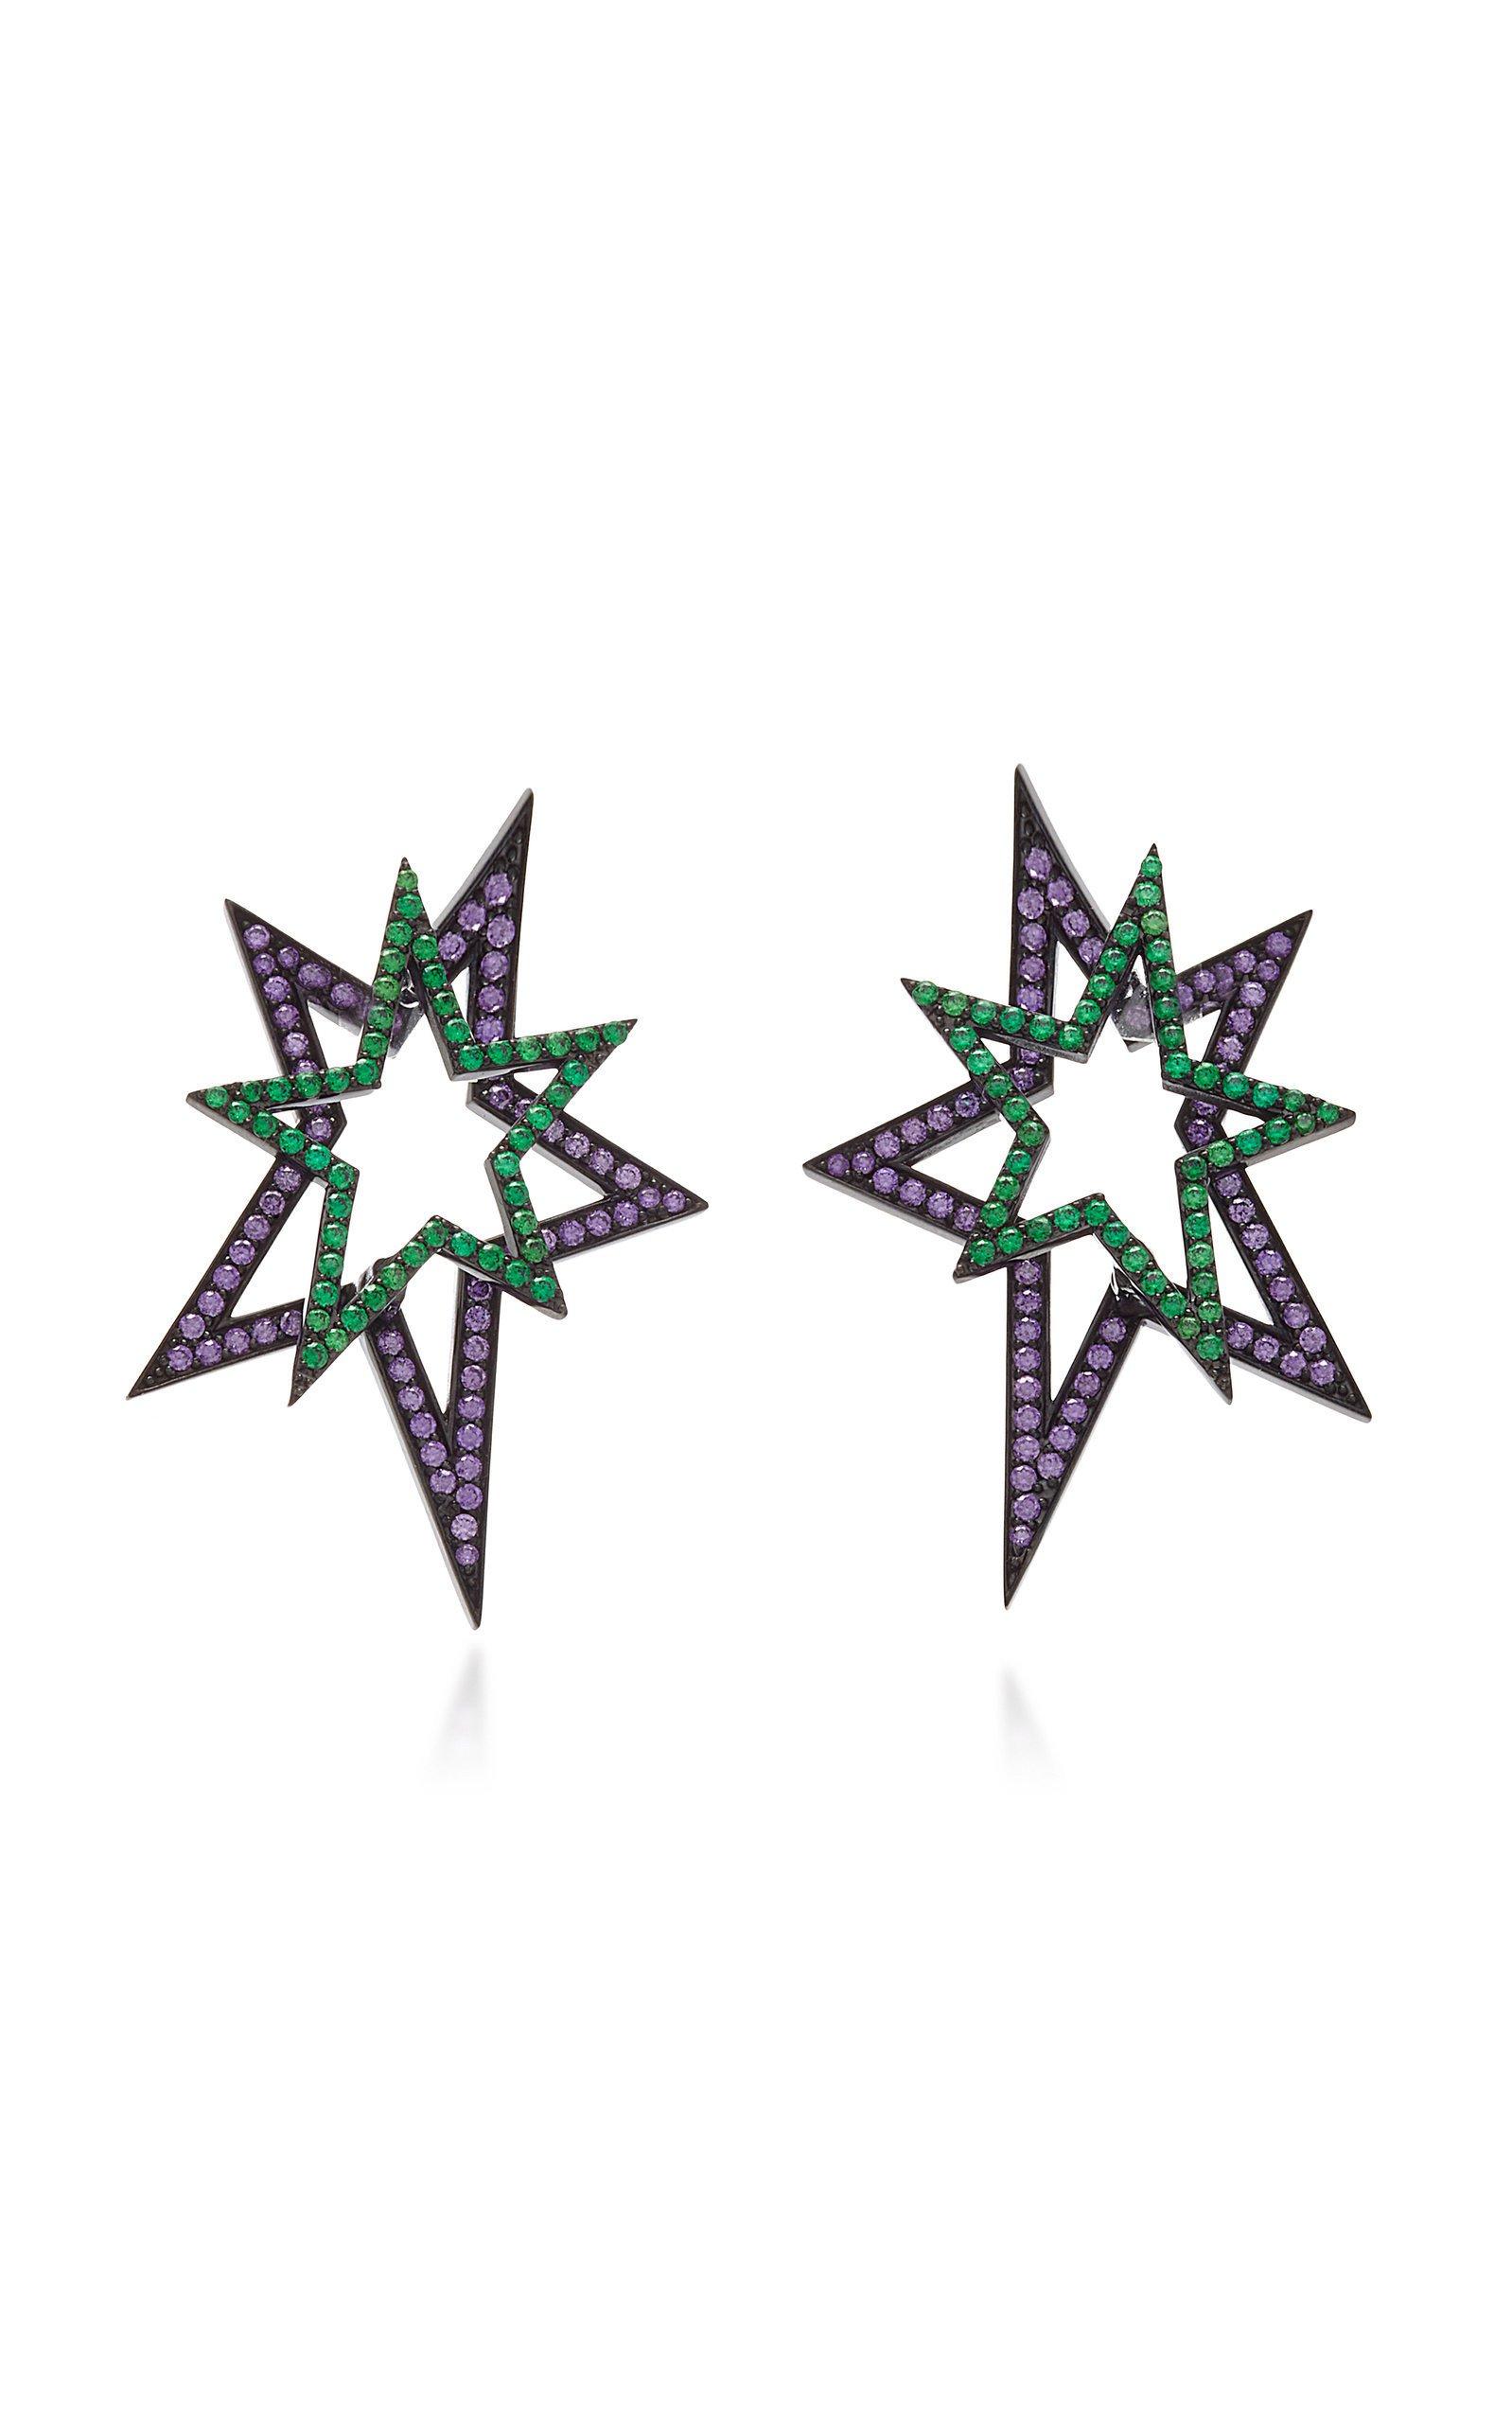 Lynn Ban Jewelry FRONT & BACK STAR STUD